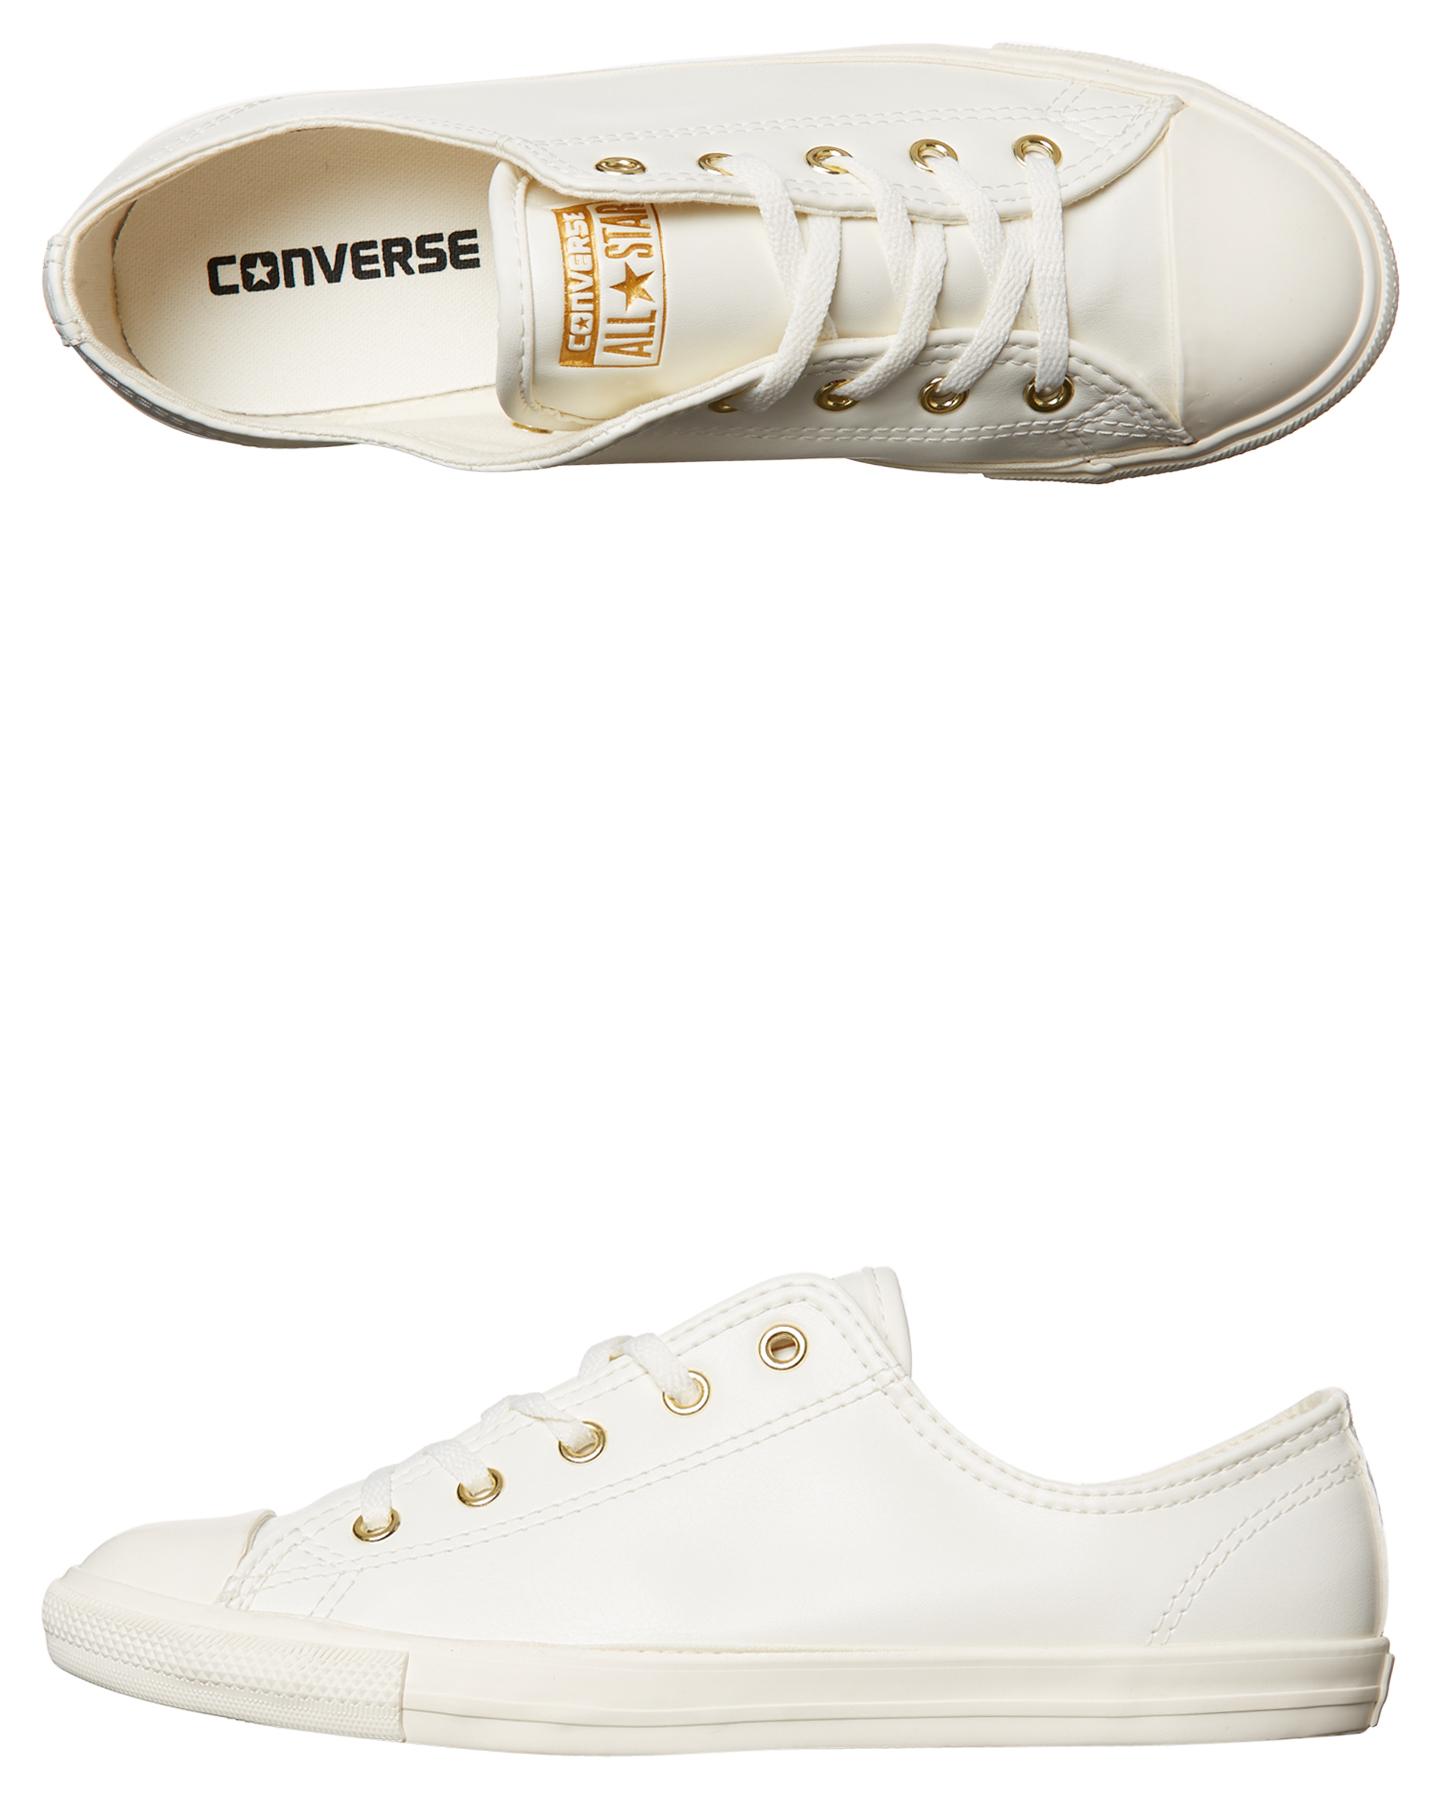 71de5b44bb2dcf EGRET WHITE WOMENS FOOTWEAR CONVERSE SNEAKERS - 557995EGRET ...